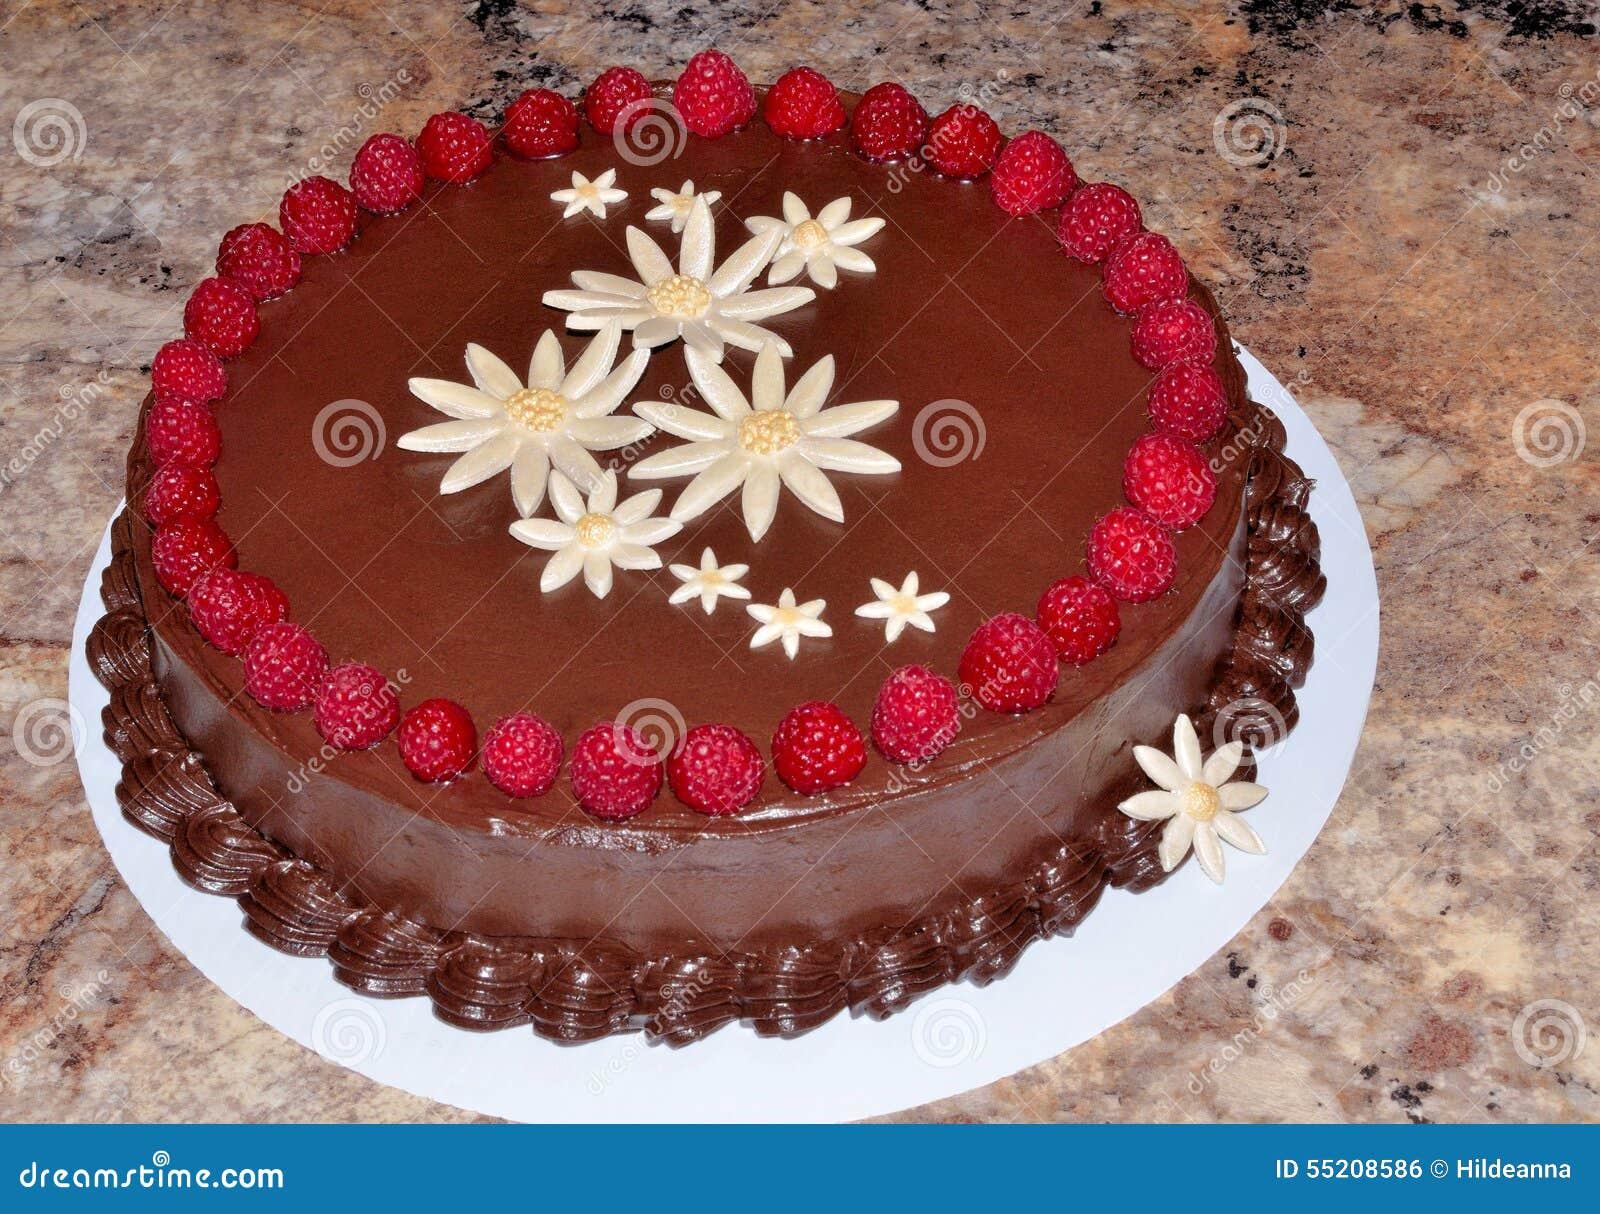 Preparing A Cake For Fondant Icing